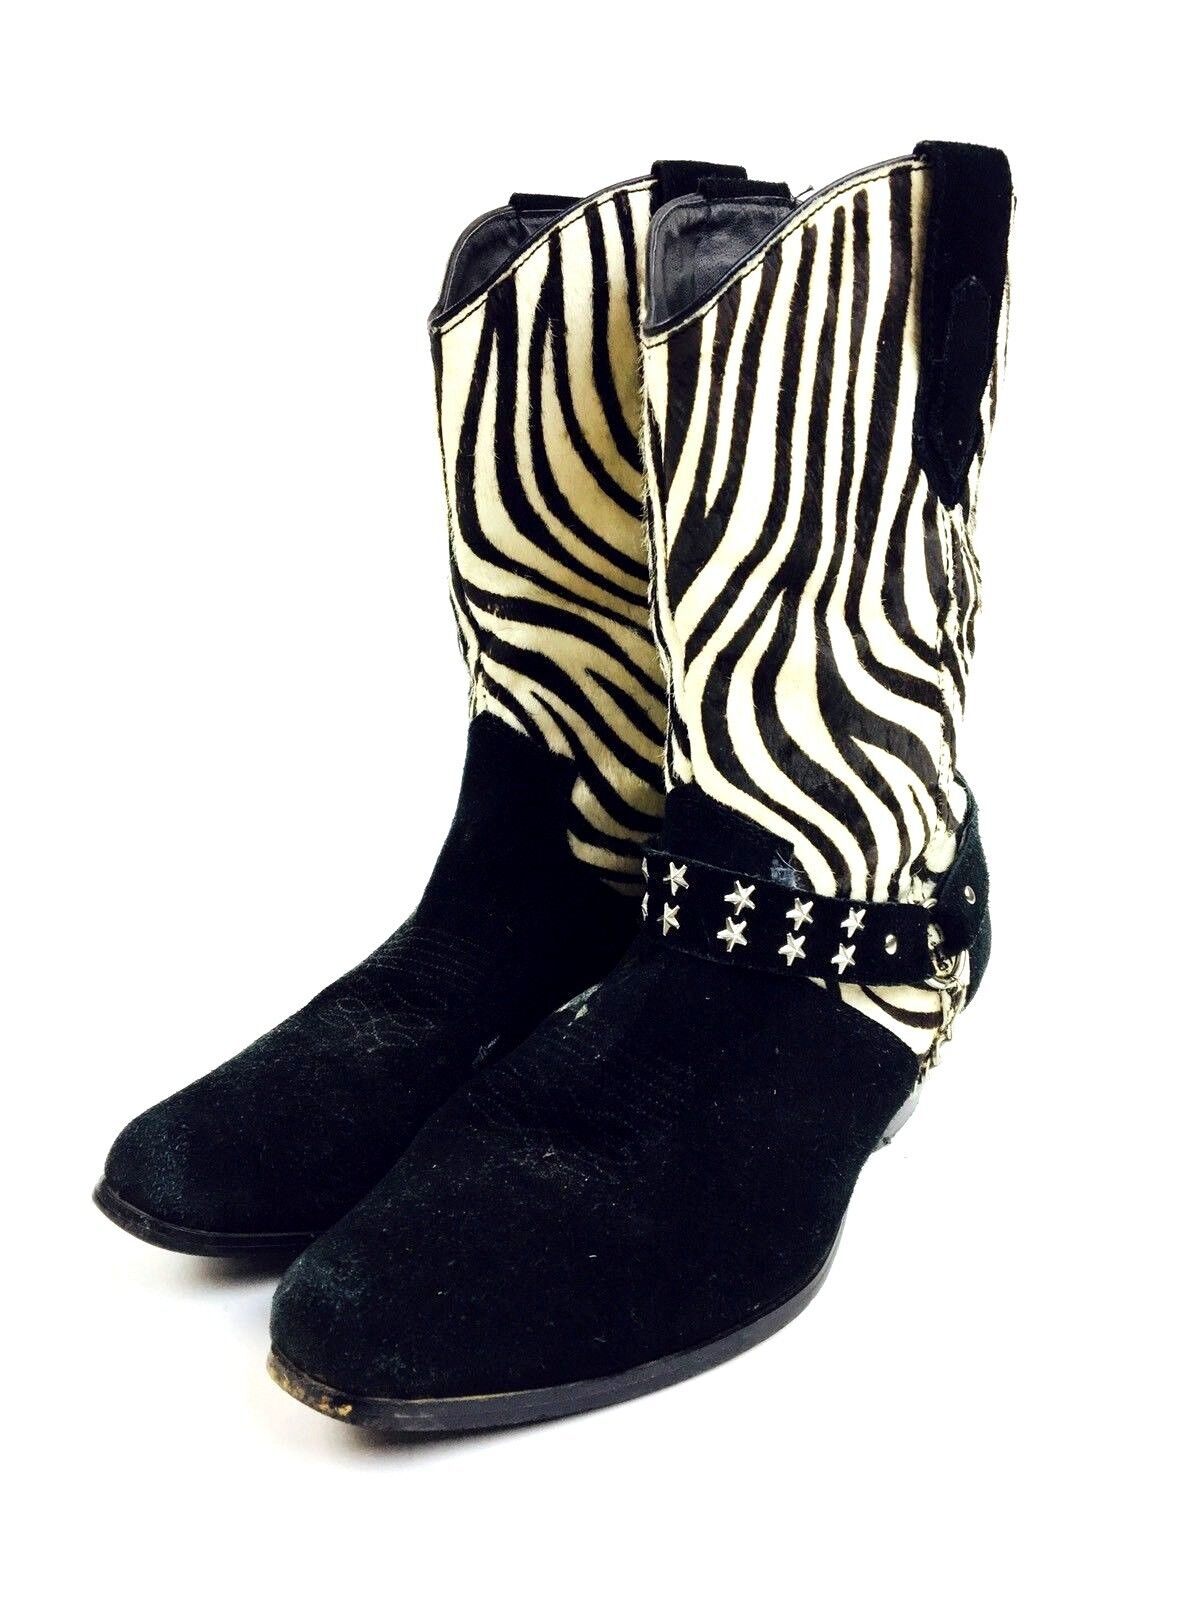 Zebra Cowboy Boots Women's Shoes Women's Boots He… - image 3